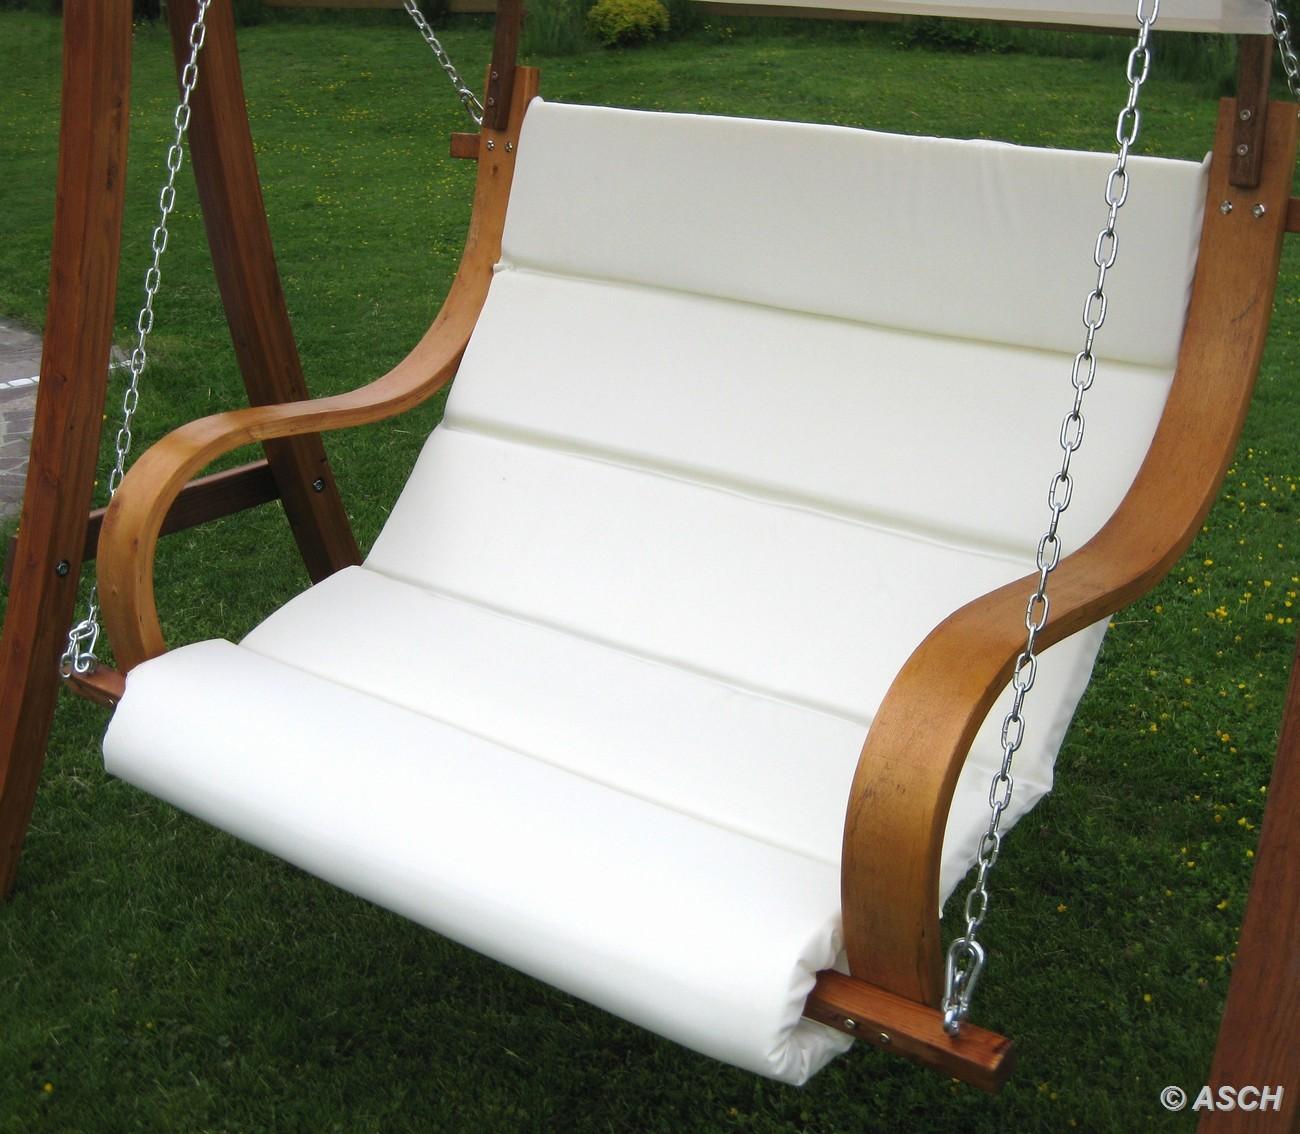 design sitzbank f r hollywoodschaukel seat meru aus holz l rche inkl dach ohne gestell. Black Bedroom Furniture Sets. Home Design Ideas